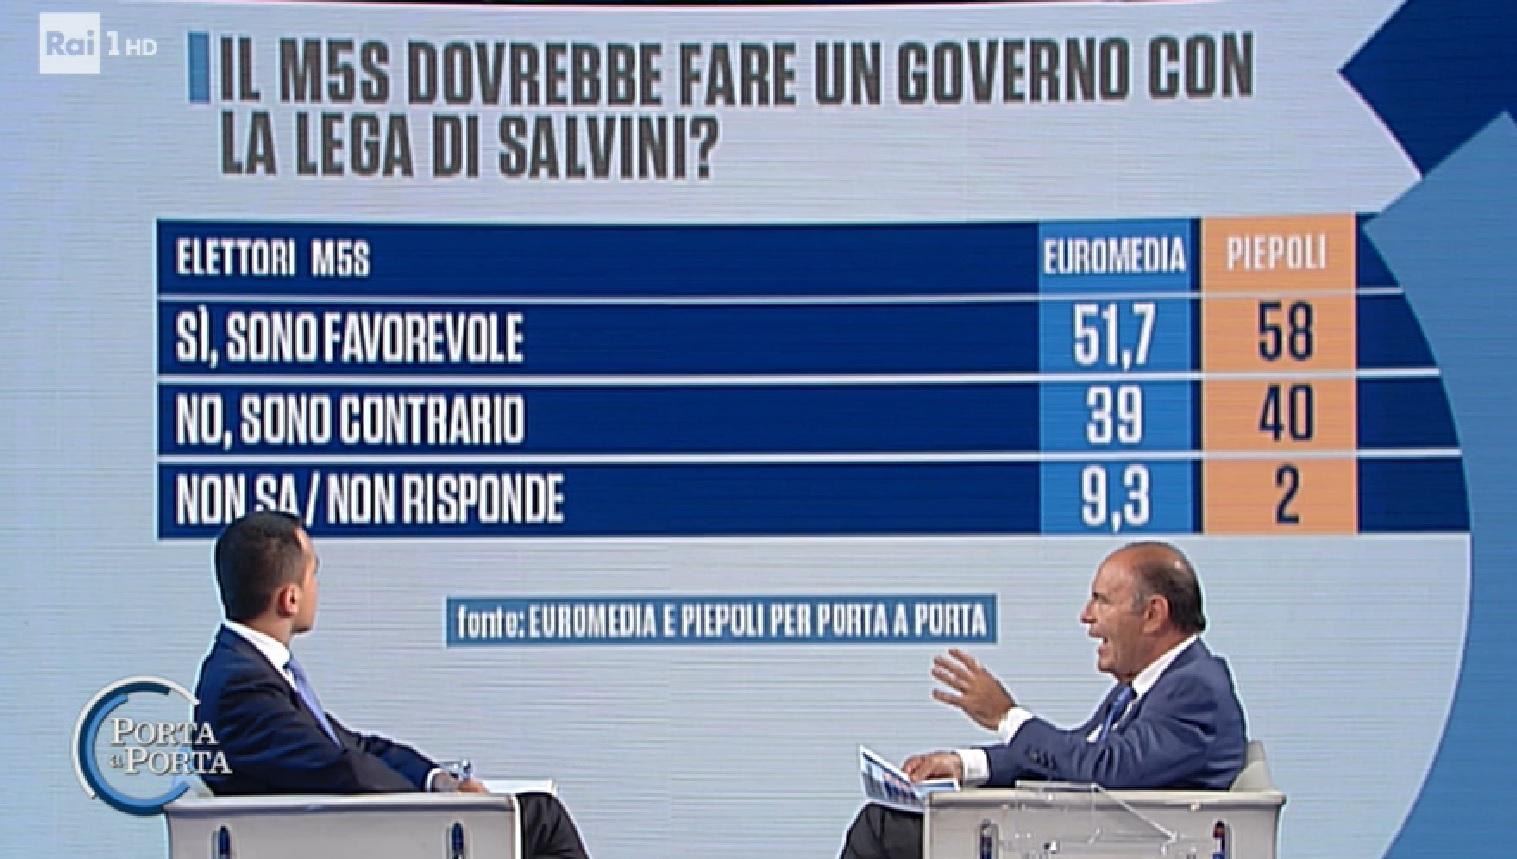 sondaggi politici euromedia piepoli, m5s lega